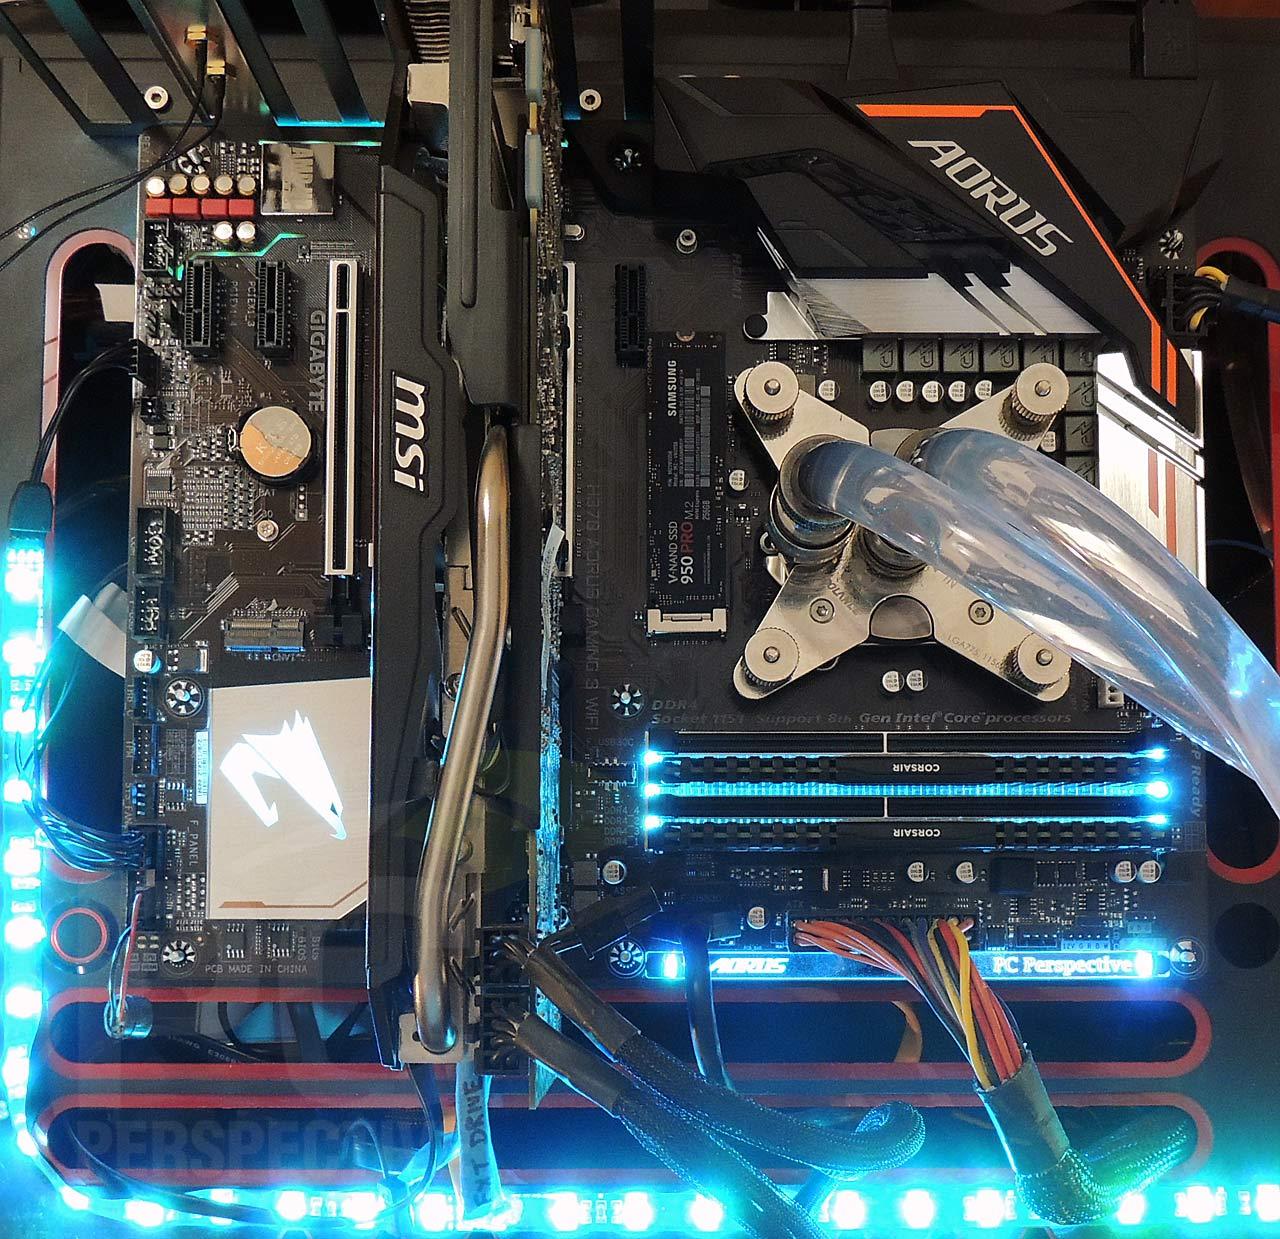 GIGABYTE H370 AORUS Gaming 3 WIFI Motherboard Review